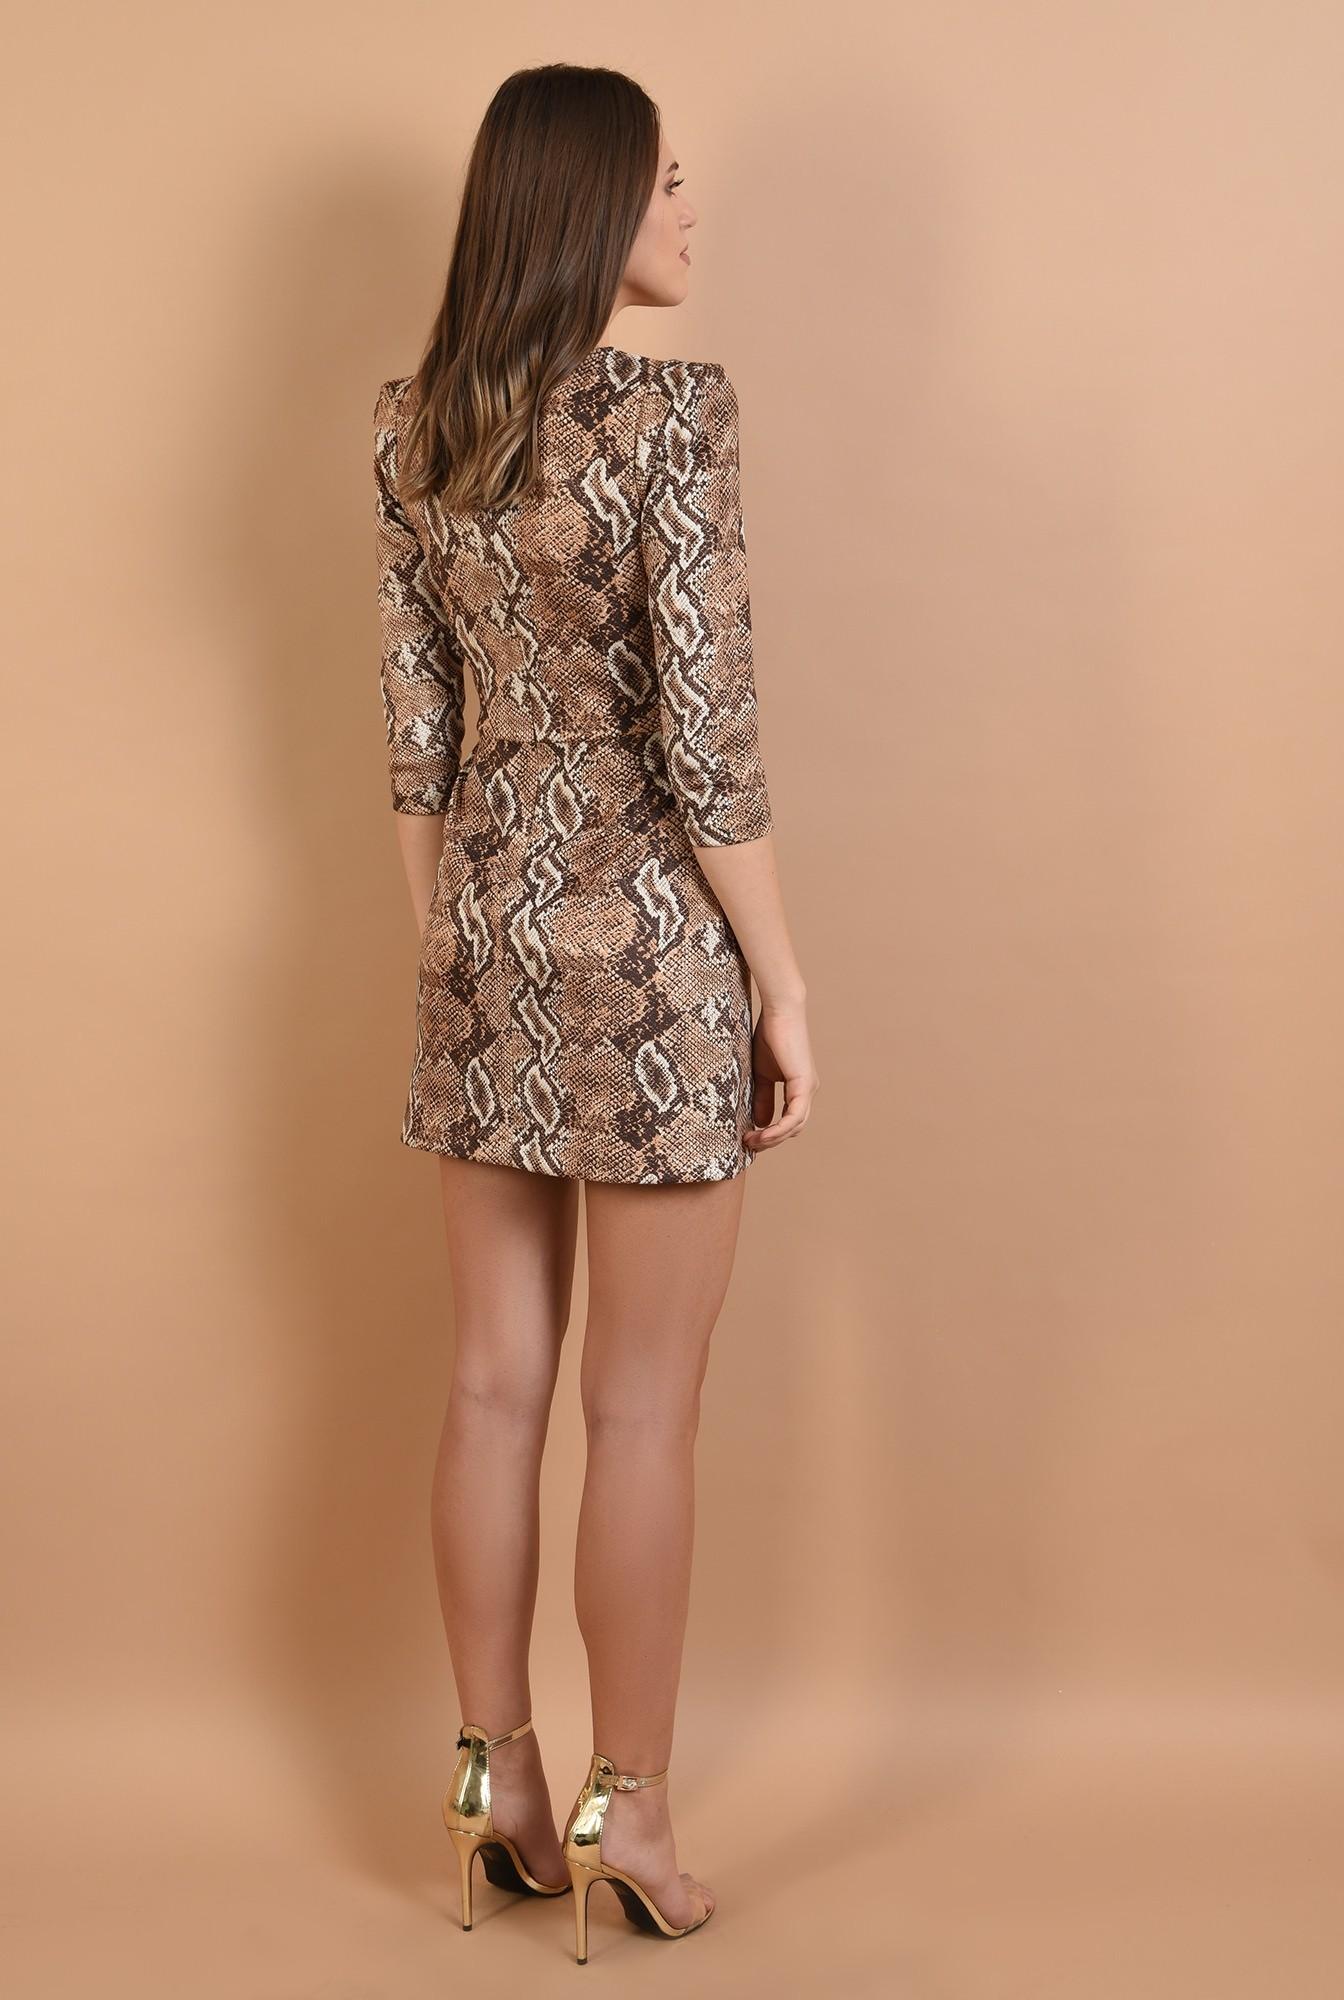 1 - 360 - rochie eleganta, scurta, animal print, maneci midi, cambrata